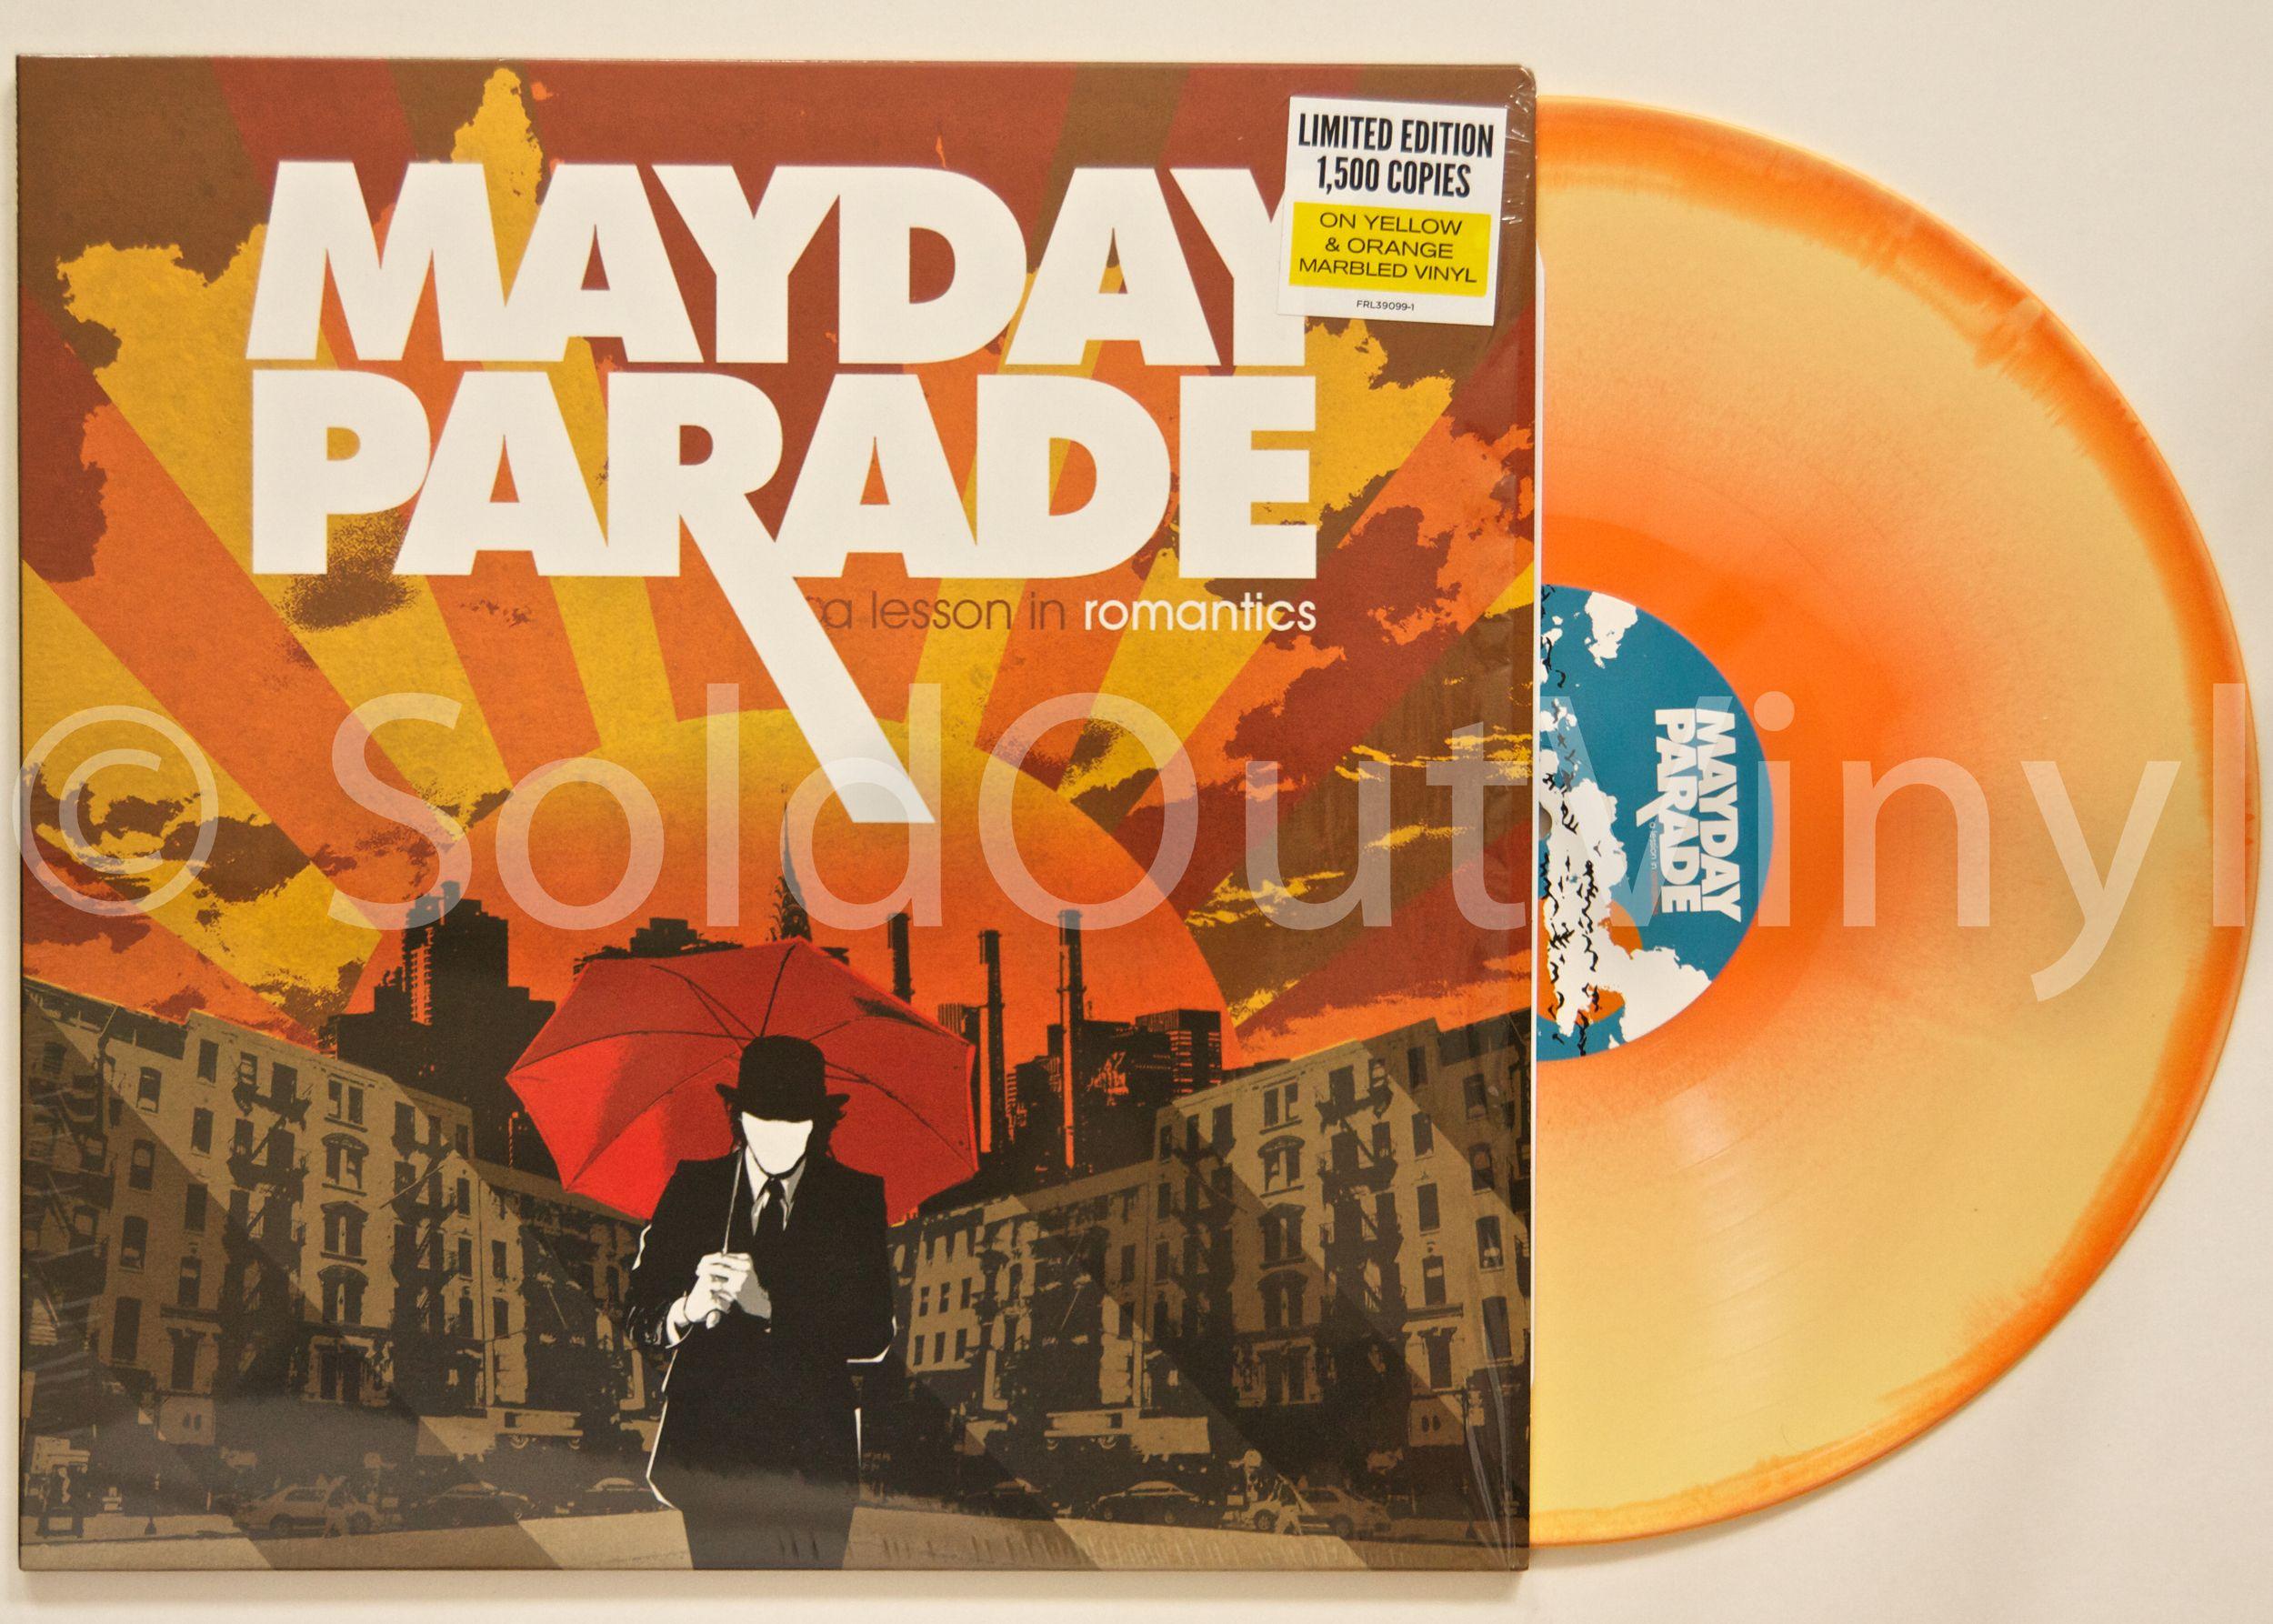 Mayday Parade A Lesson In Romantics Vinyl Lp Soldoutvinyl Mayday Parade Vinyl Romantic